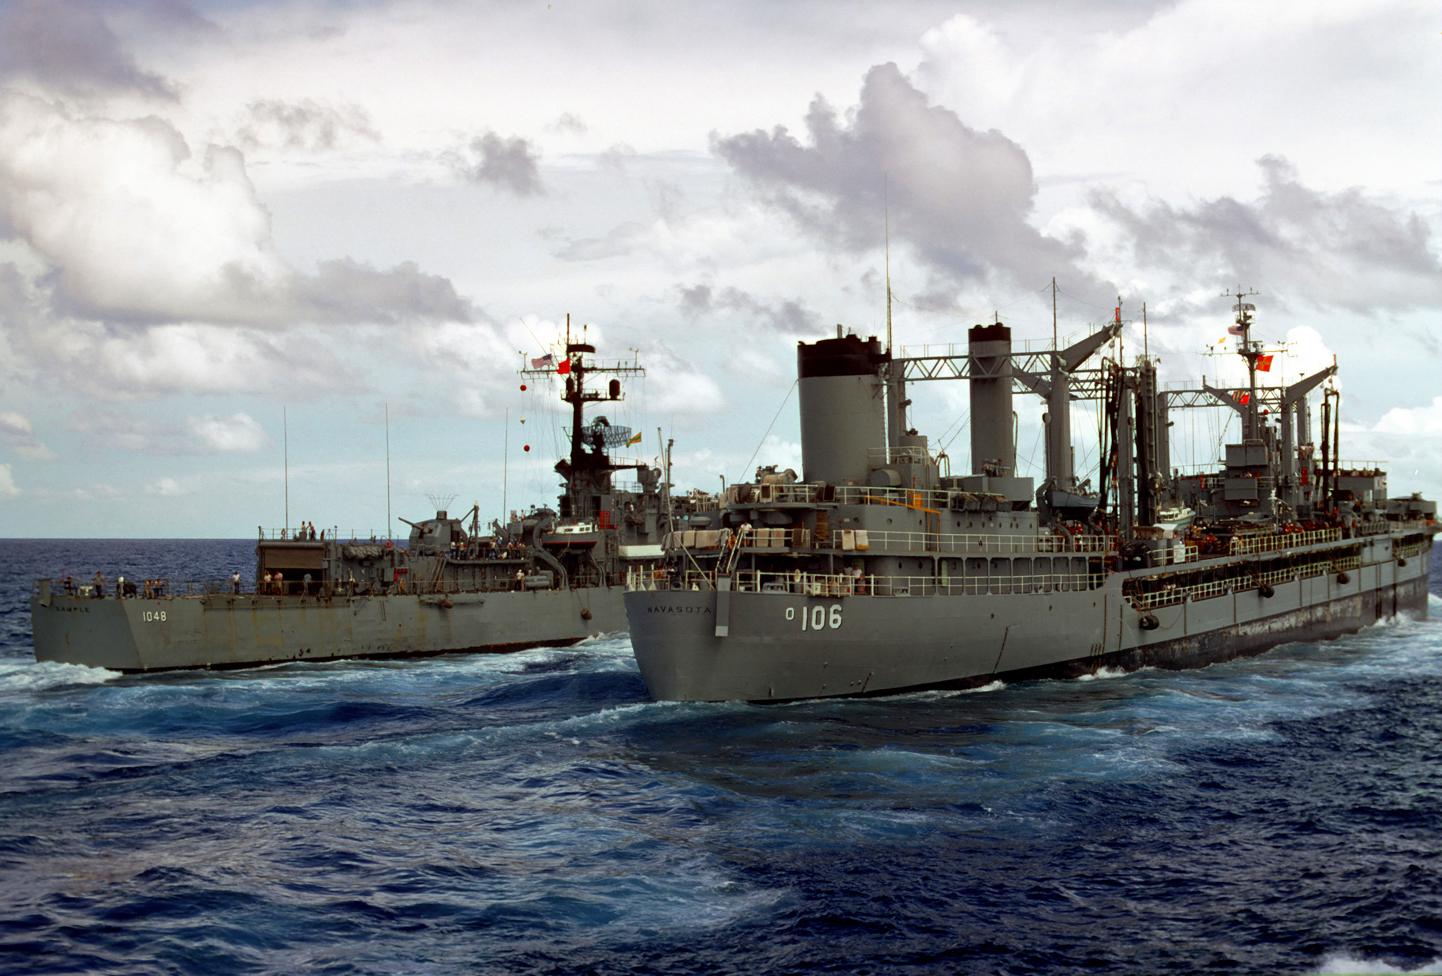 USS Thomaston Refueling and Transfer Photos